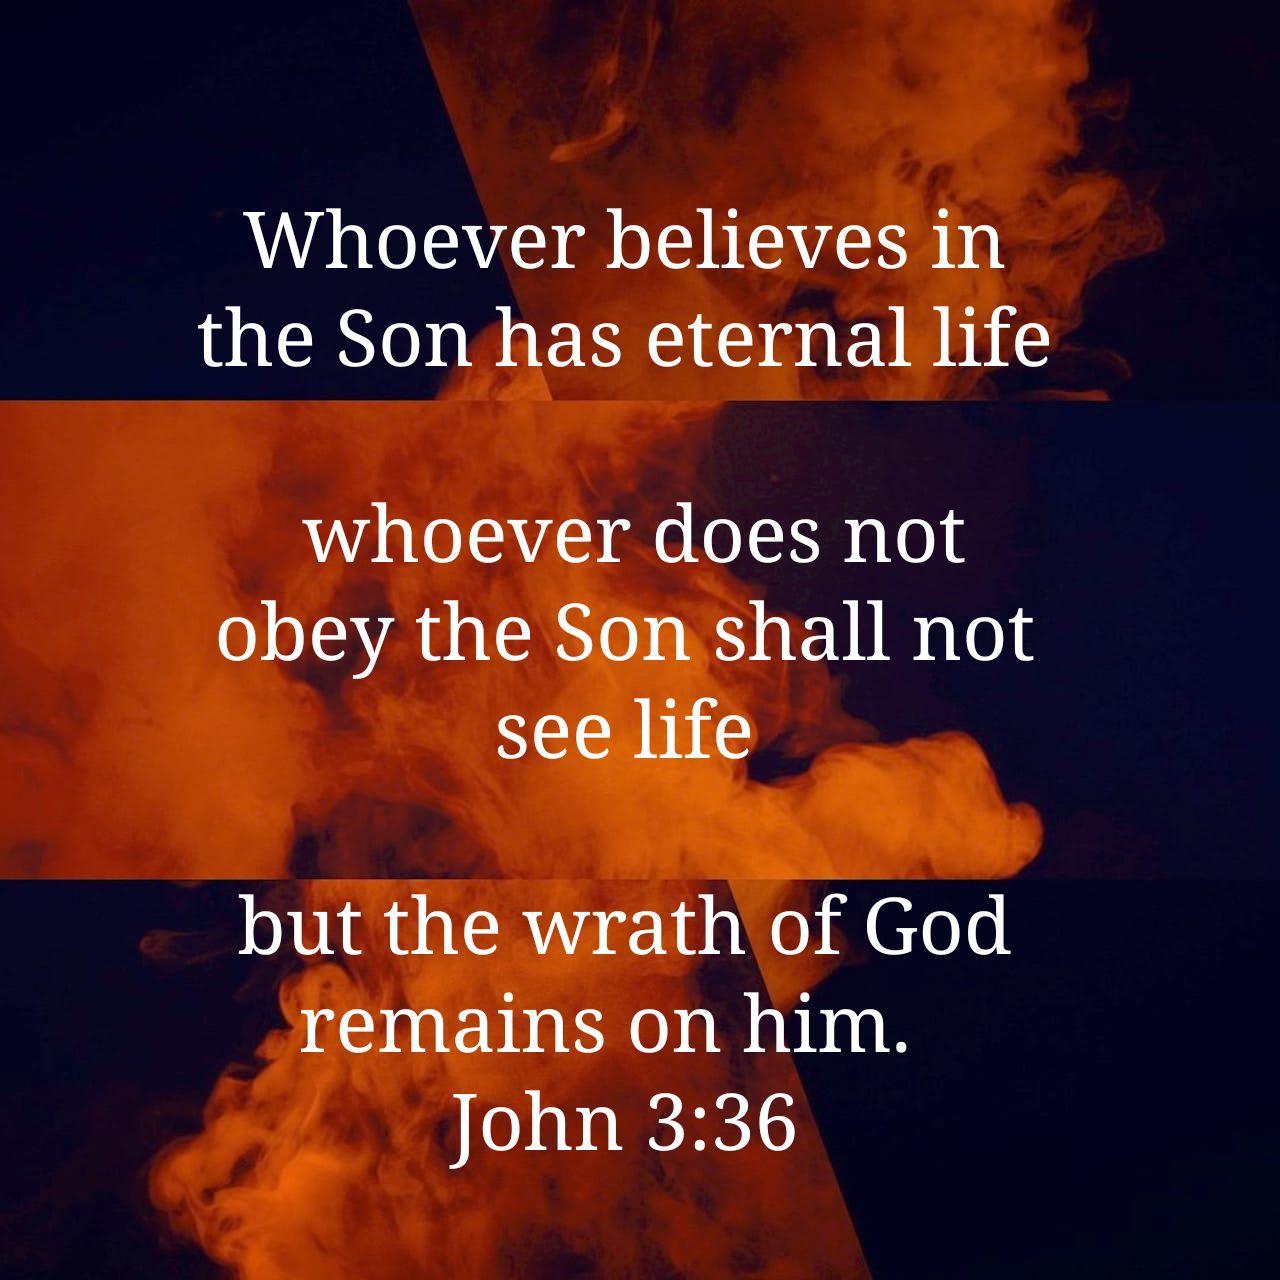 Daily Bible Reading: John 3:22-36